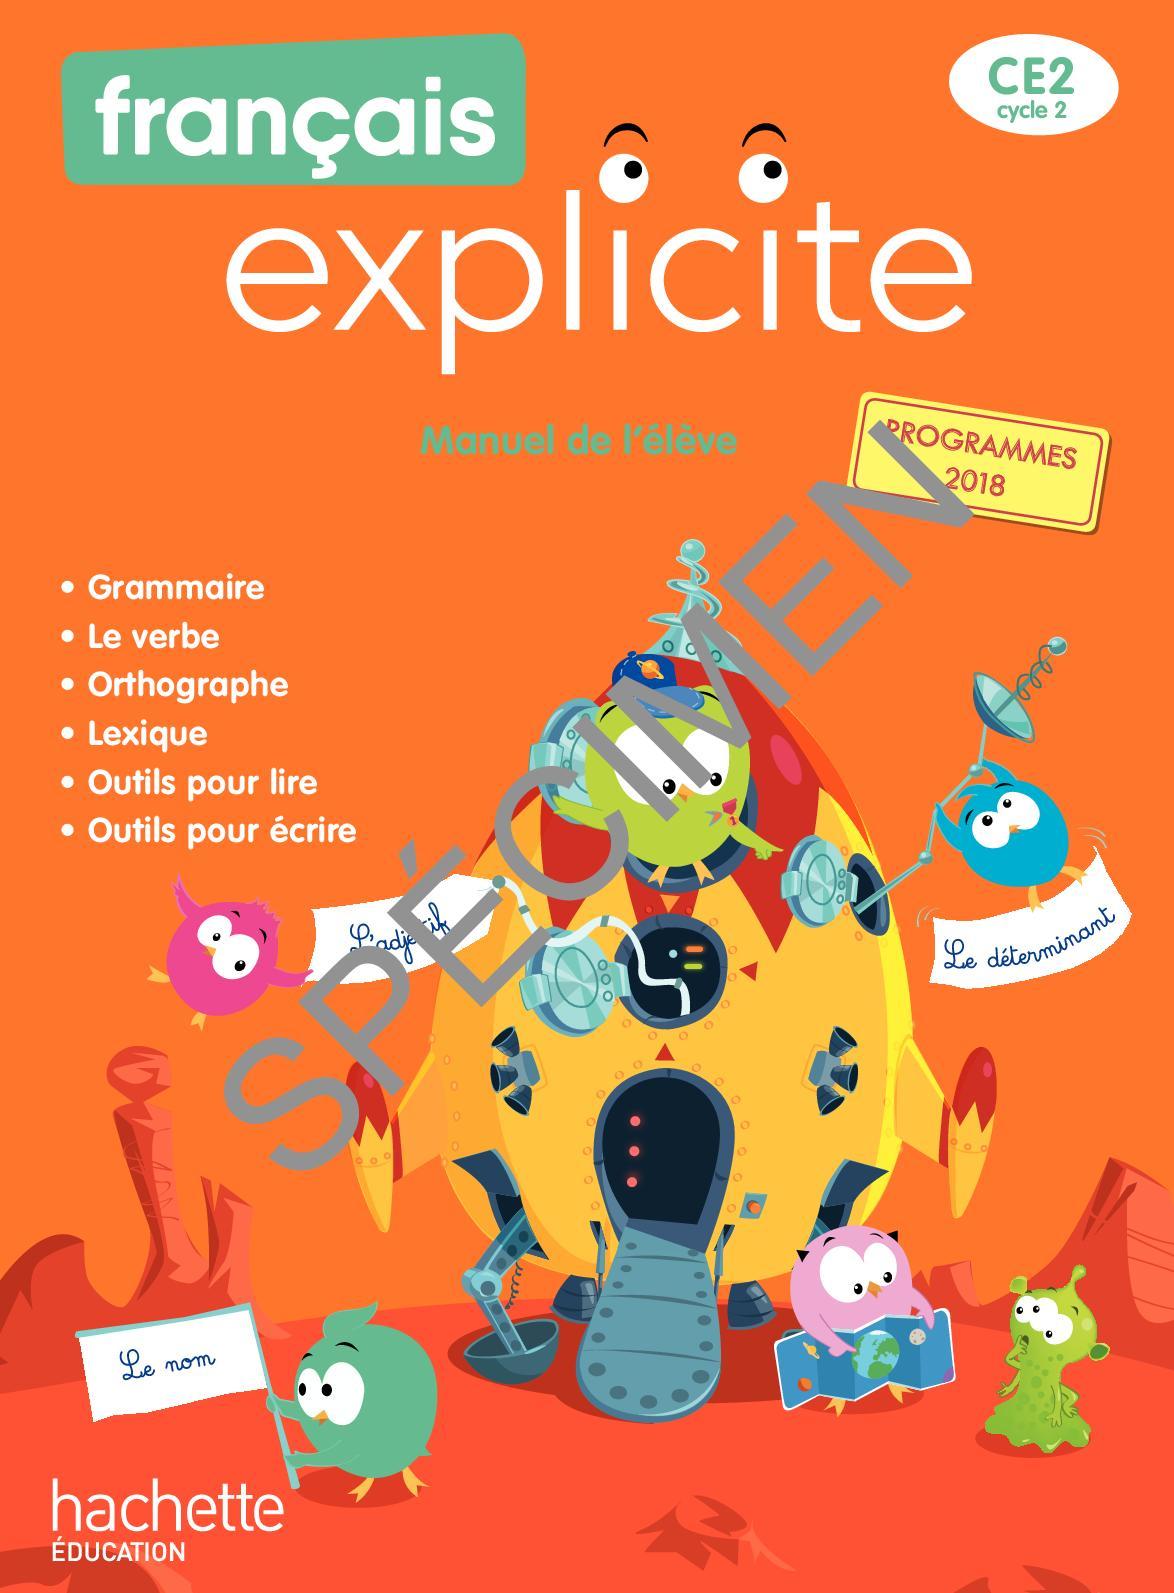 Incroyable  Mot-Clé Calaméo   Français Explicite CE32 Edition 320320